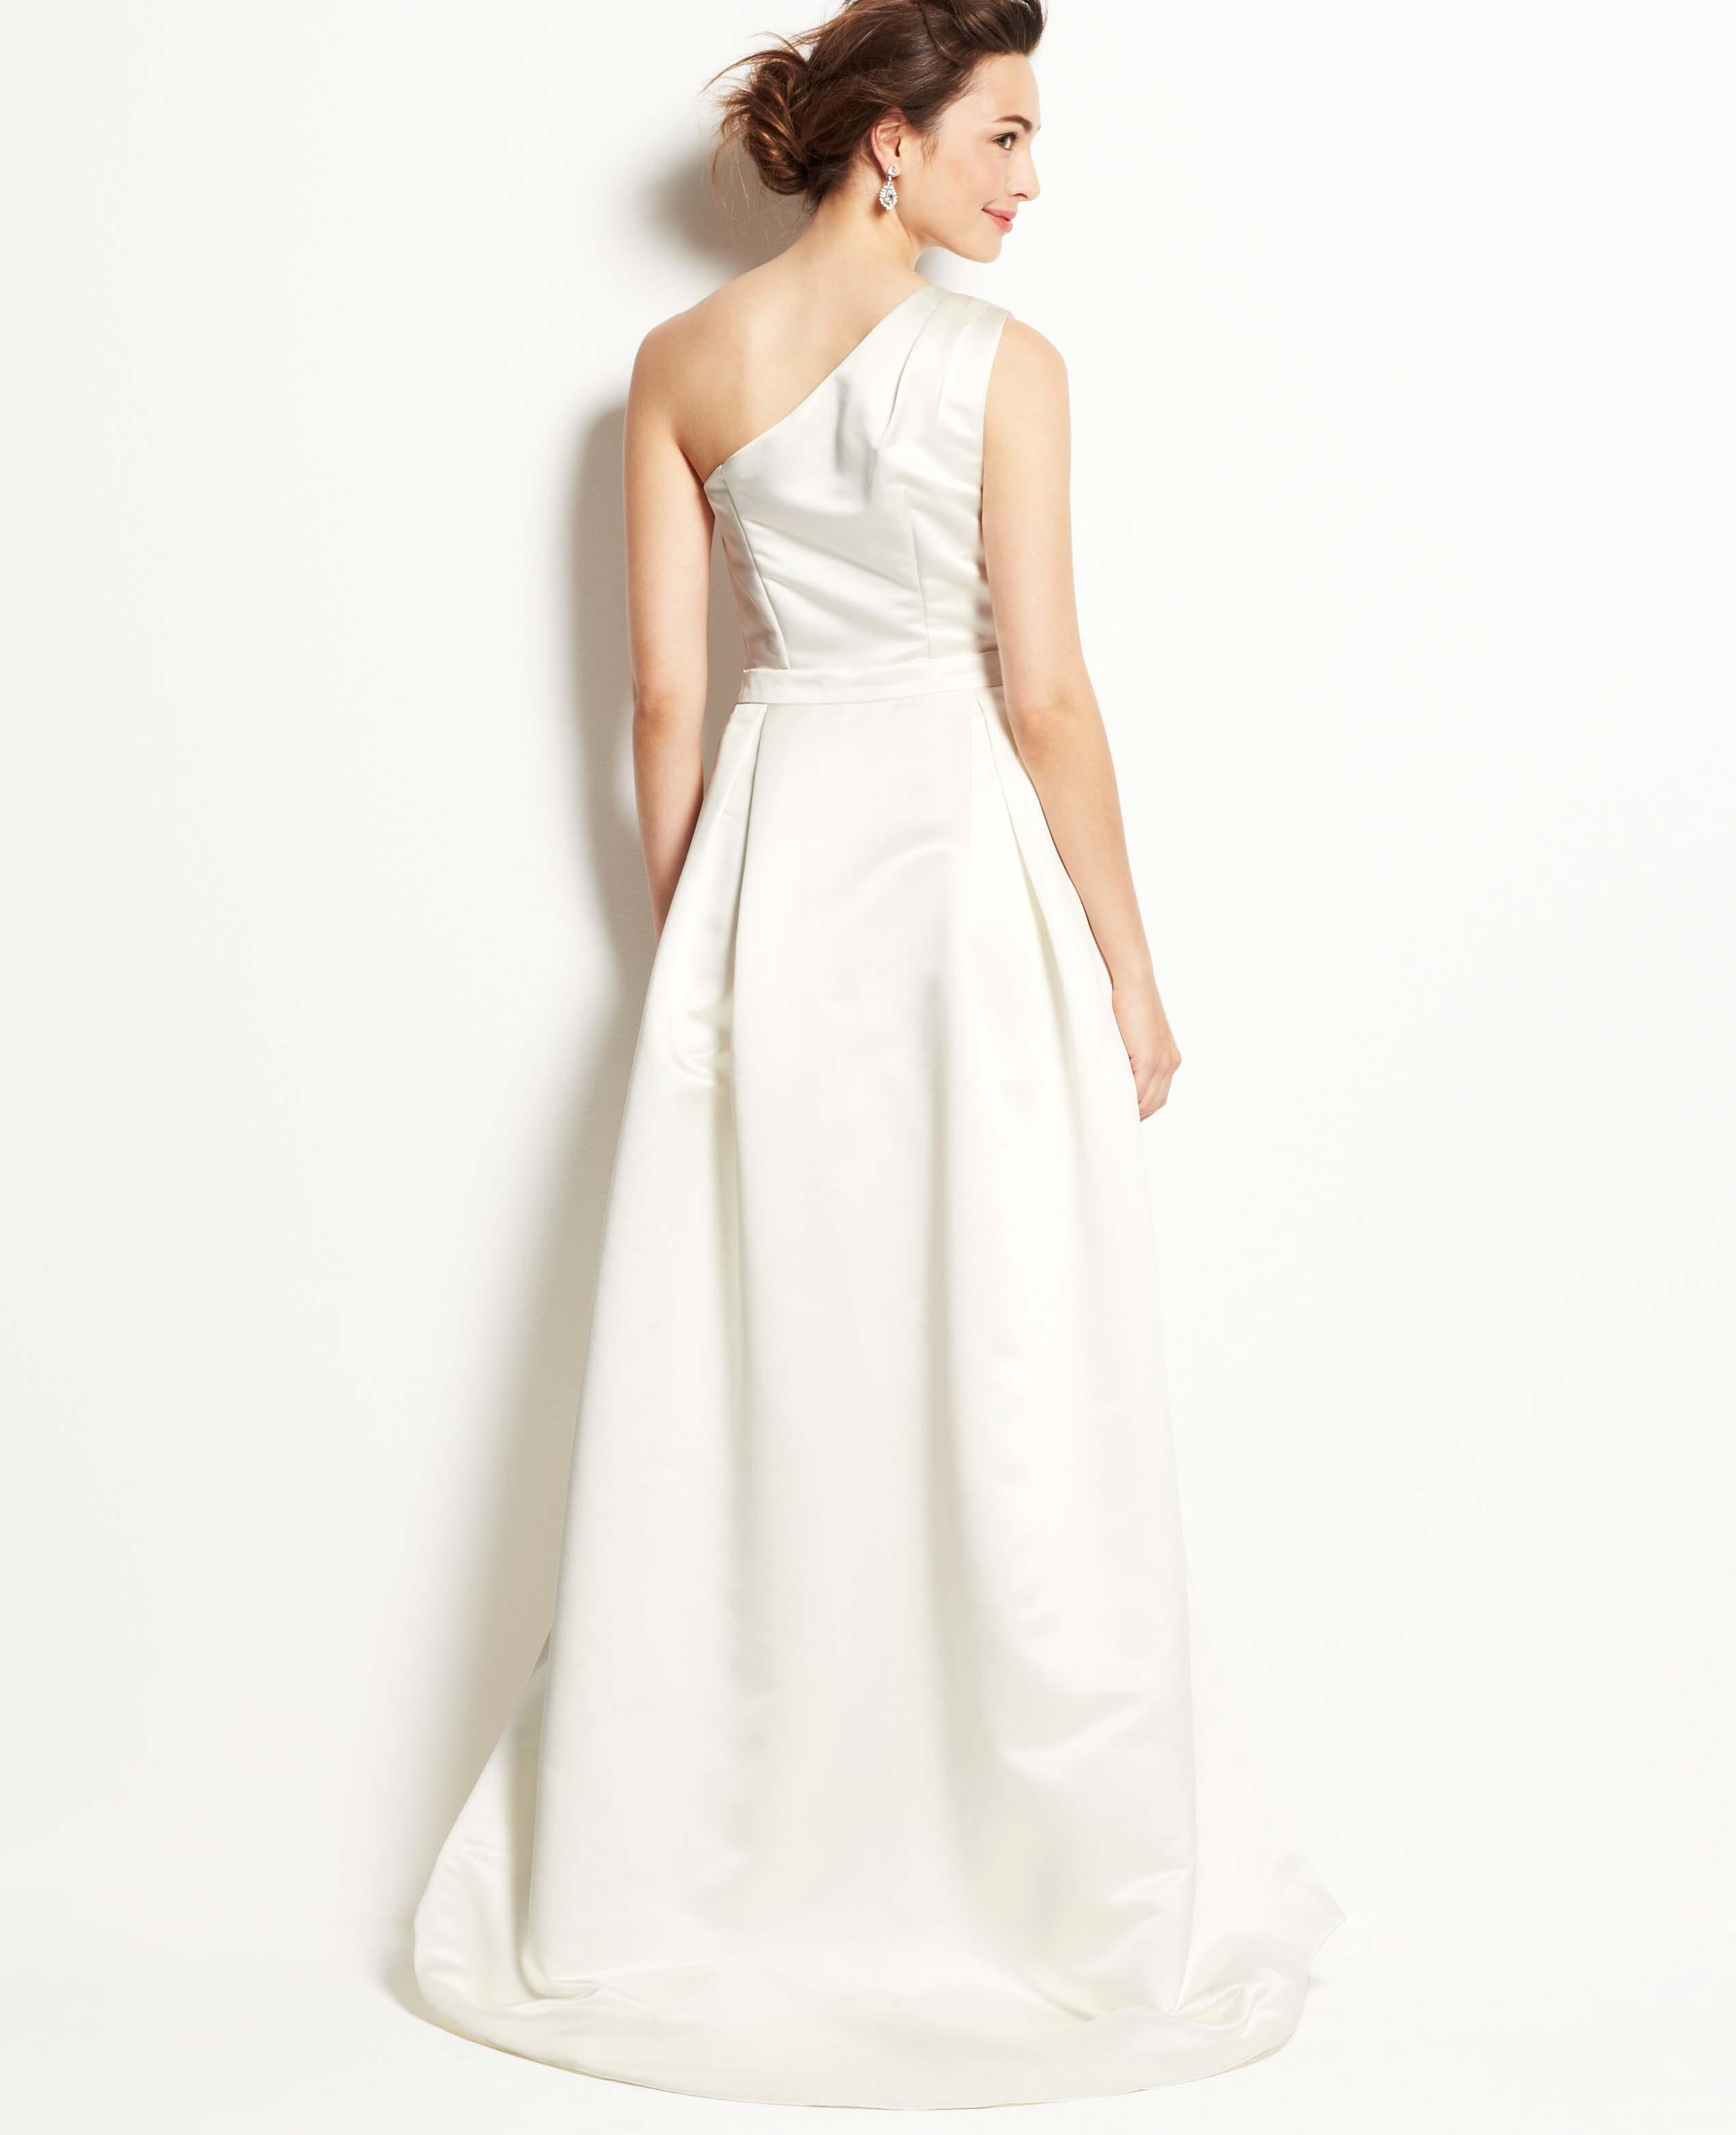 Lyst - Ann Taylor Petite Duchess Satin One Shoulder Wedding Dress in ...